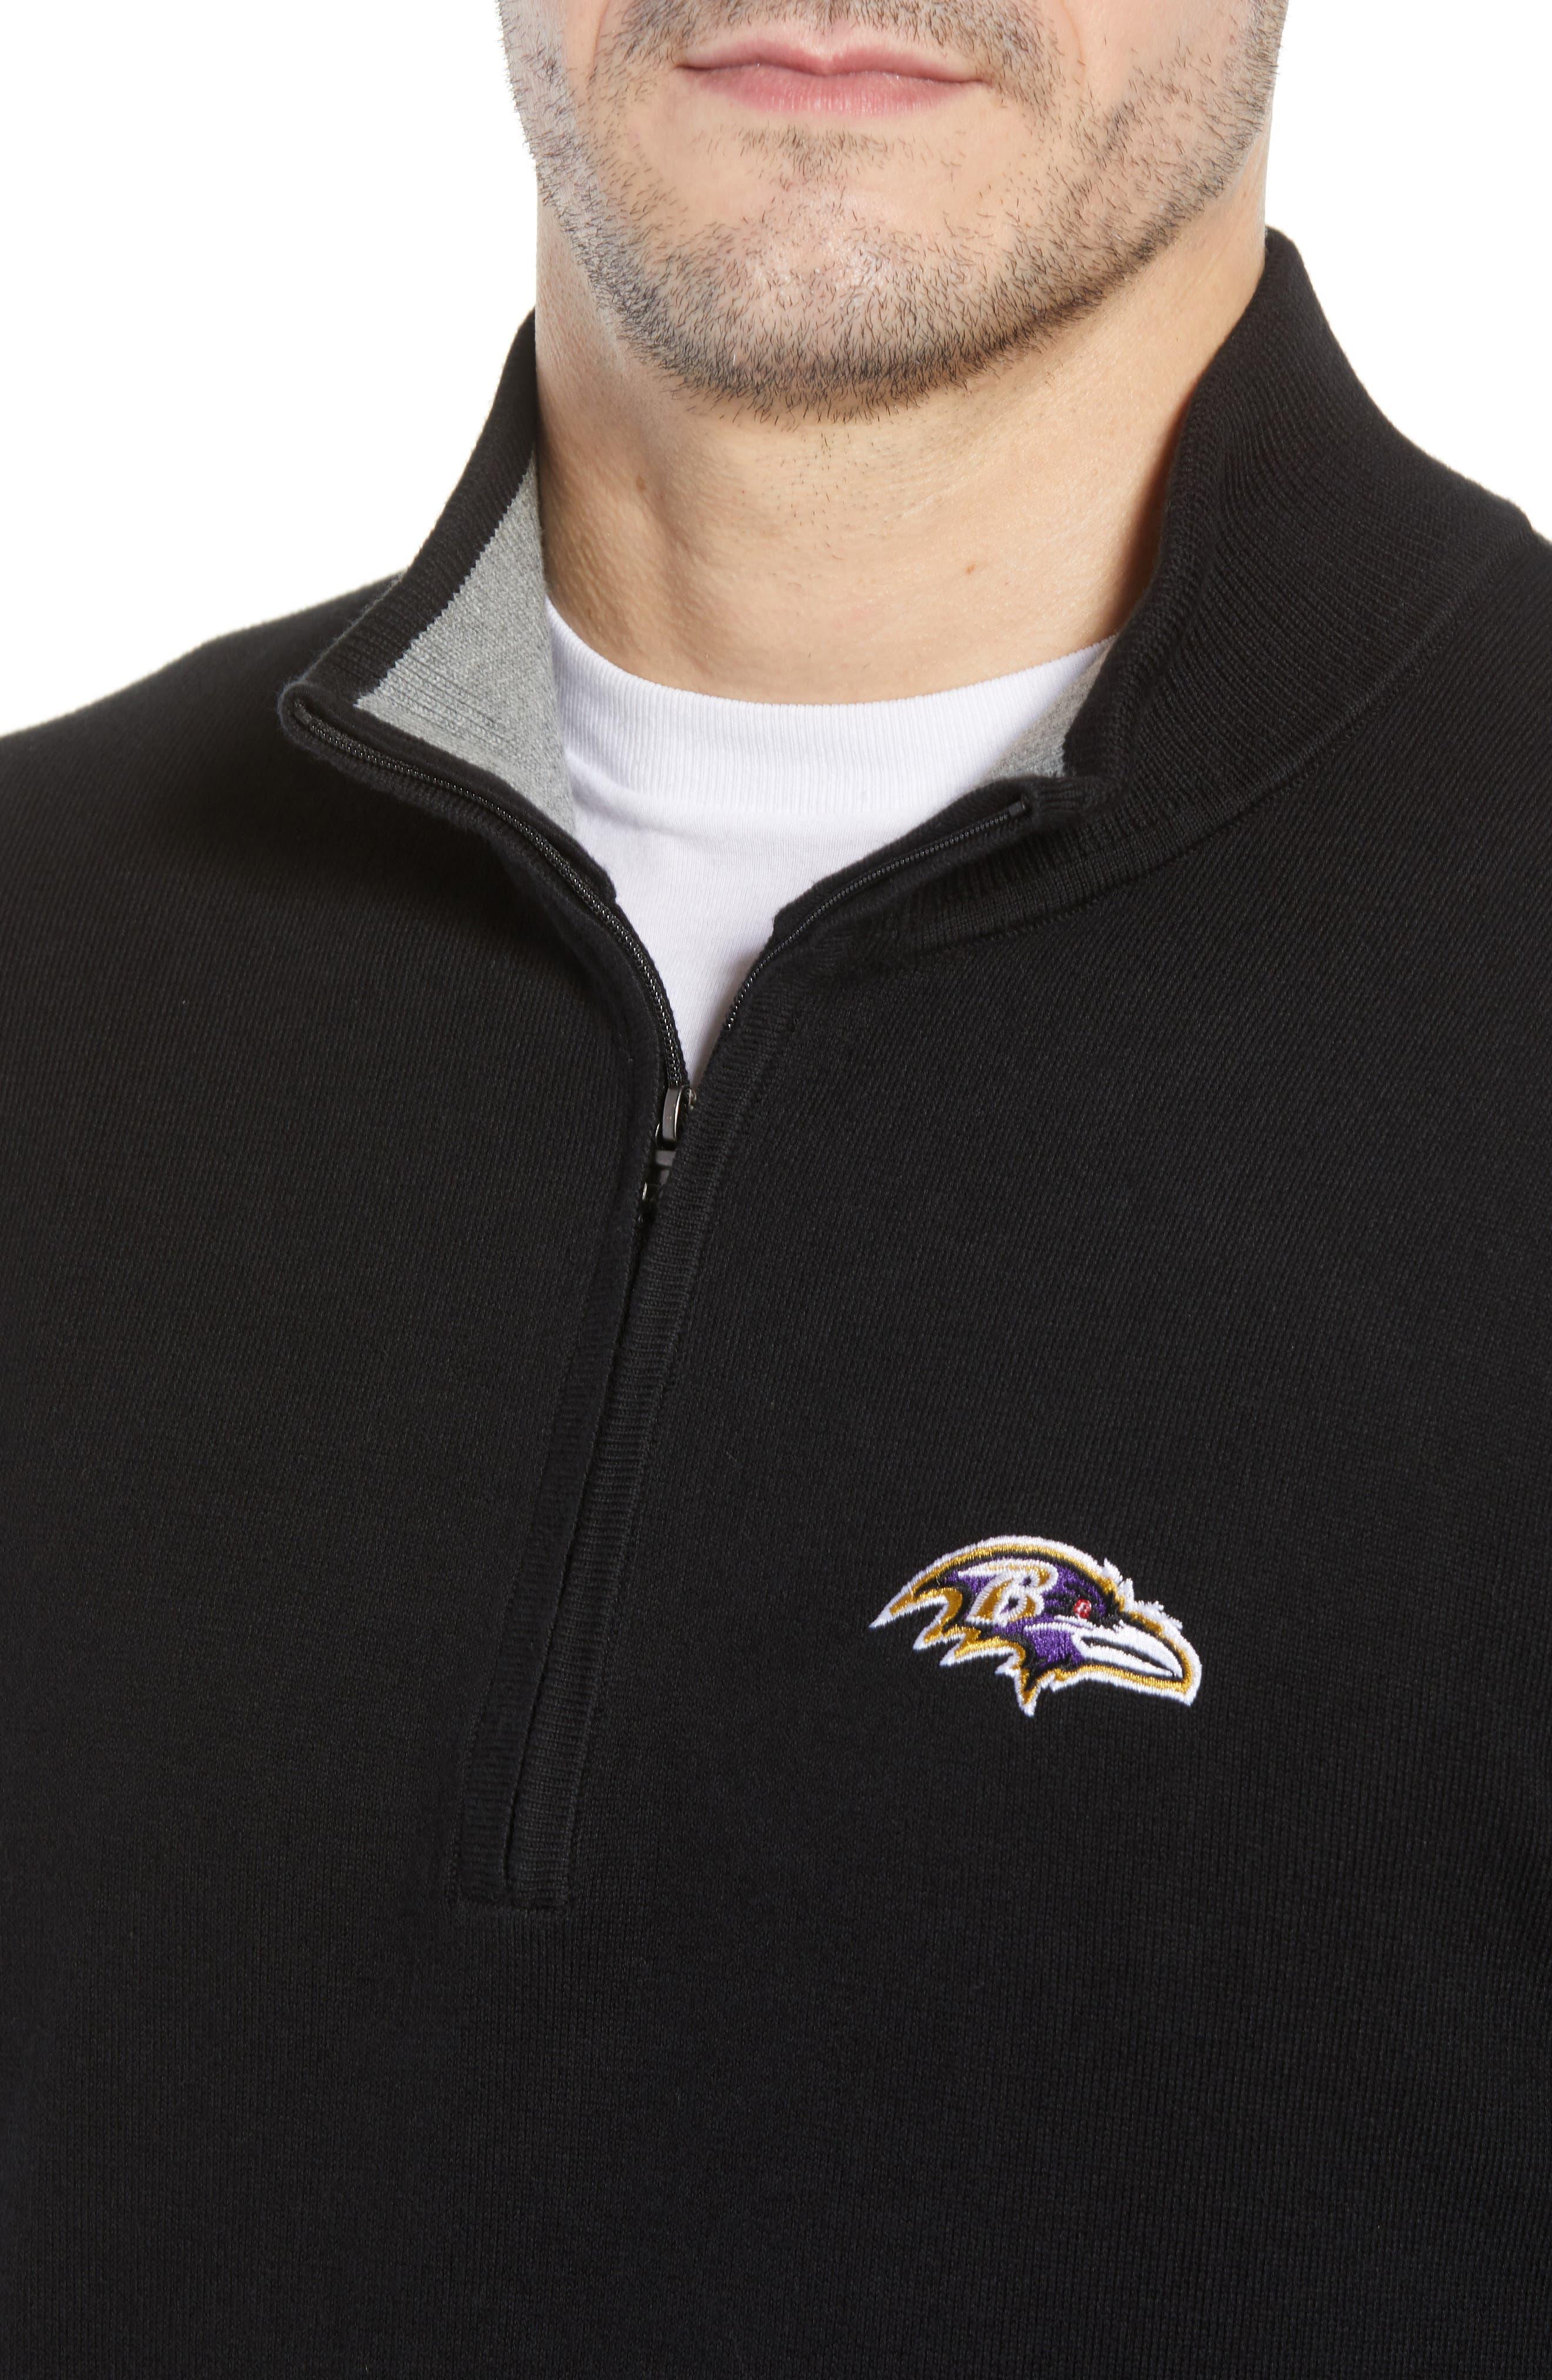 Baltimore Ravens - Lakemont Regular Fit Quarter Zip Sweater,                             Alternate thumbnail 4, color,                             BLACK